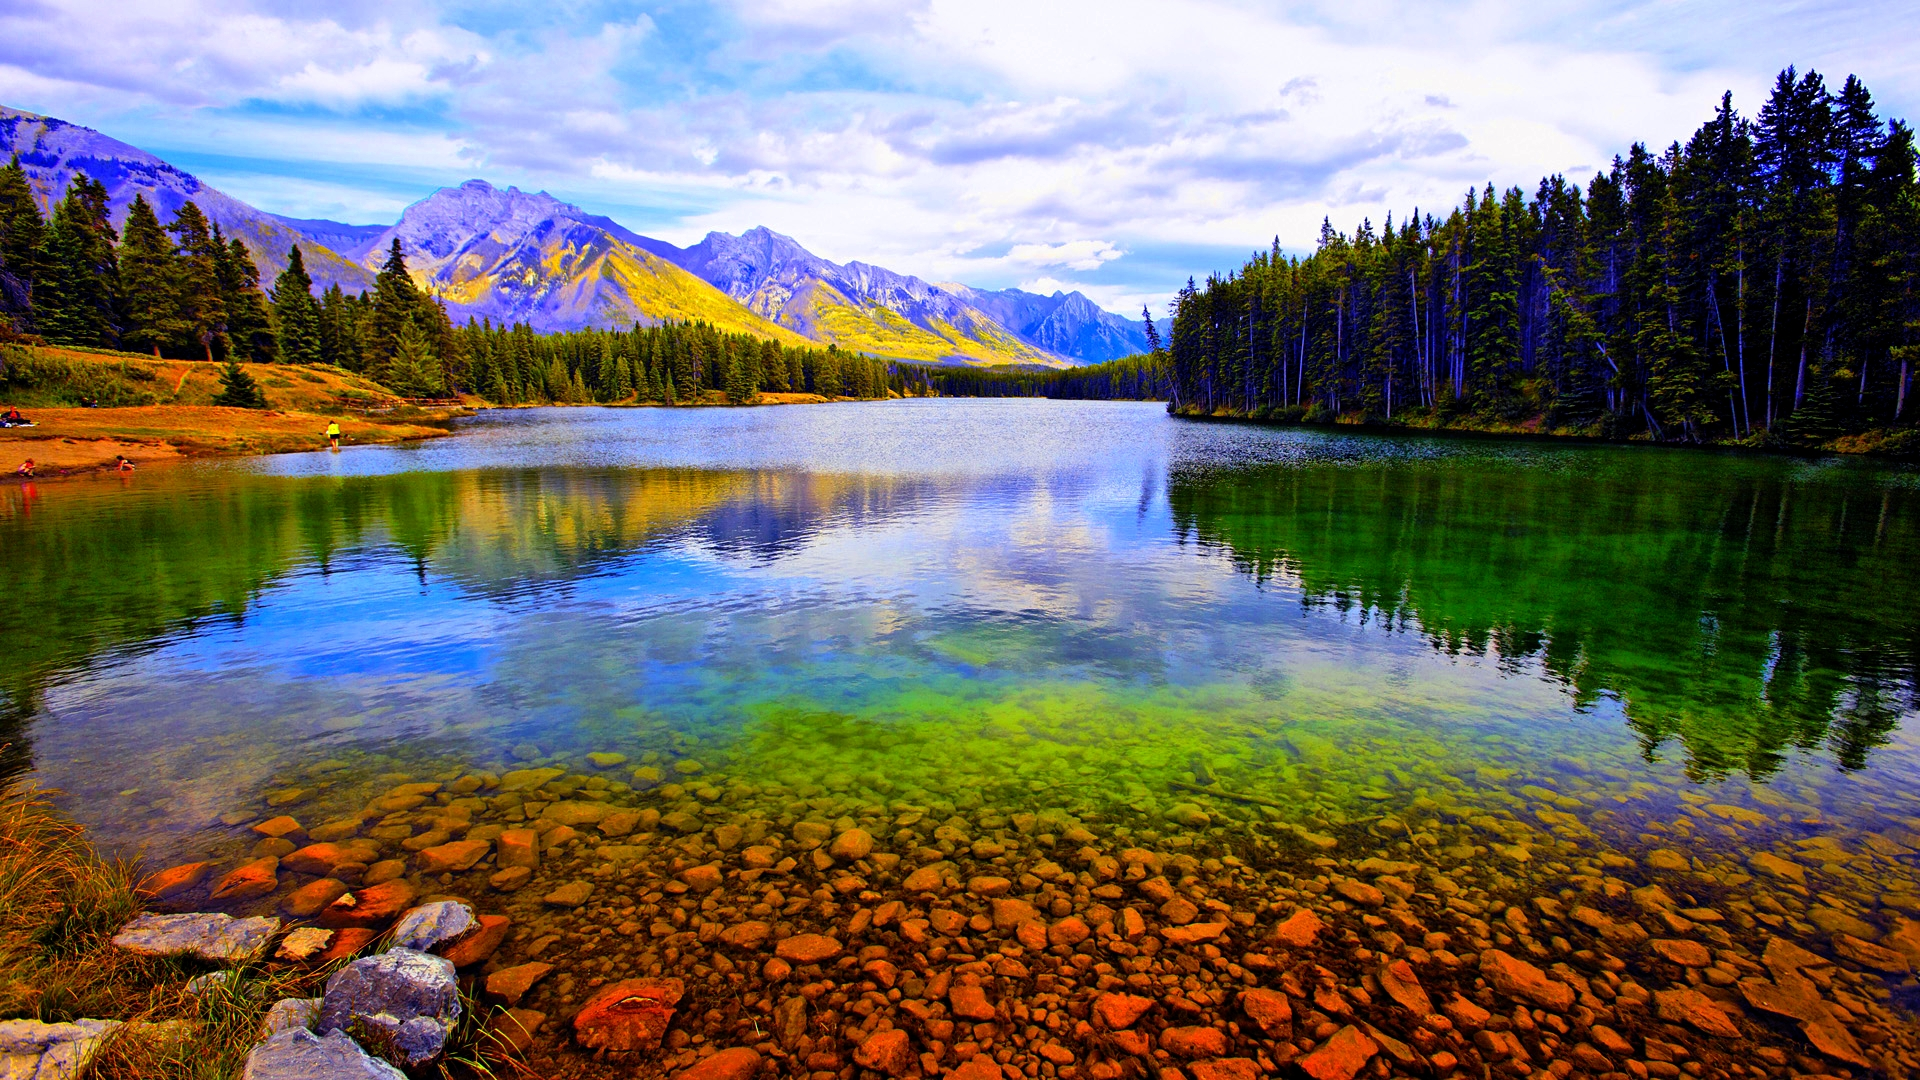 National Park Wallpaper 748187 National Park 944645 National Park 1920x1080